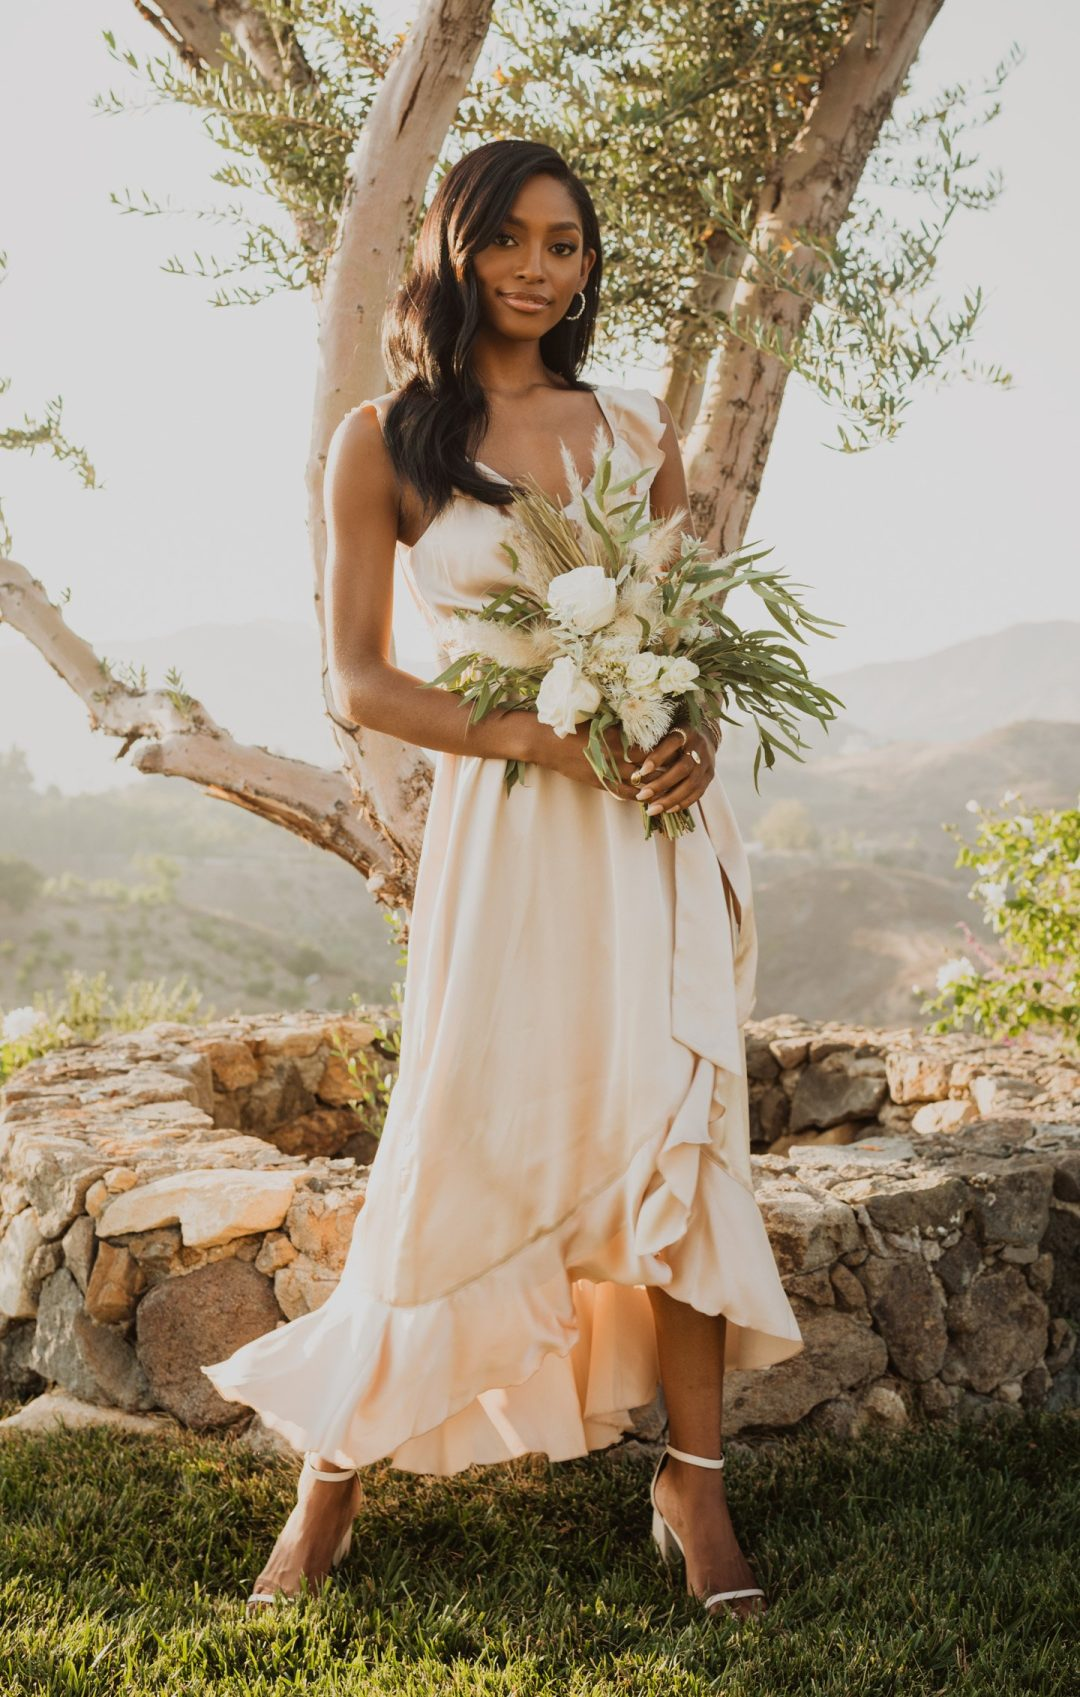 Blush pink bridesmaid dress with ruffles